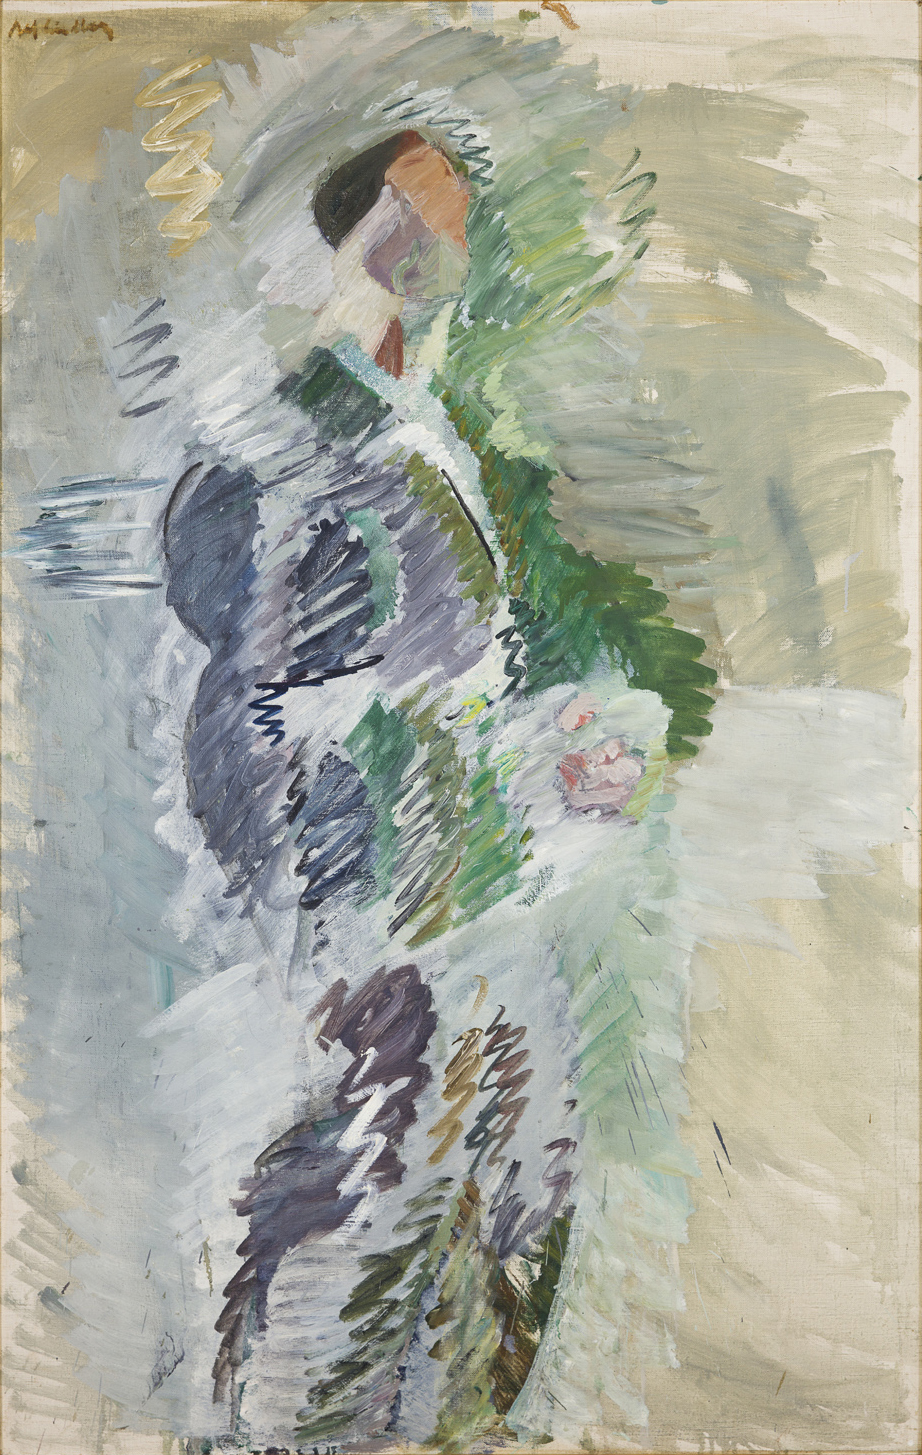 Alf Lindberg   Mansfigur II / Stående man  1955 Oil on canvas 138 x 88 cm